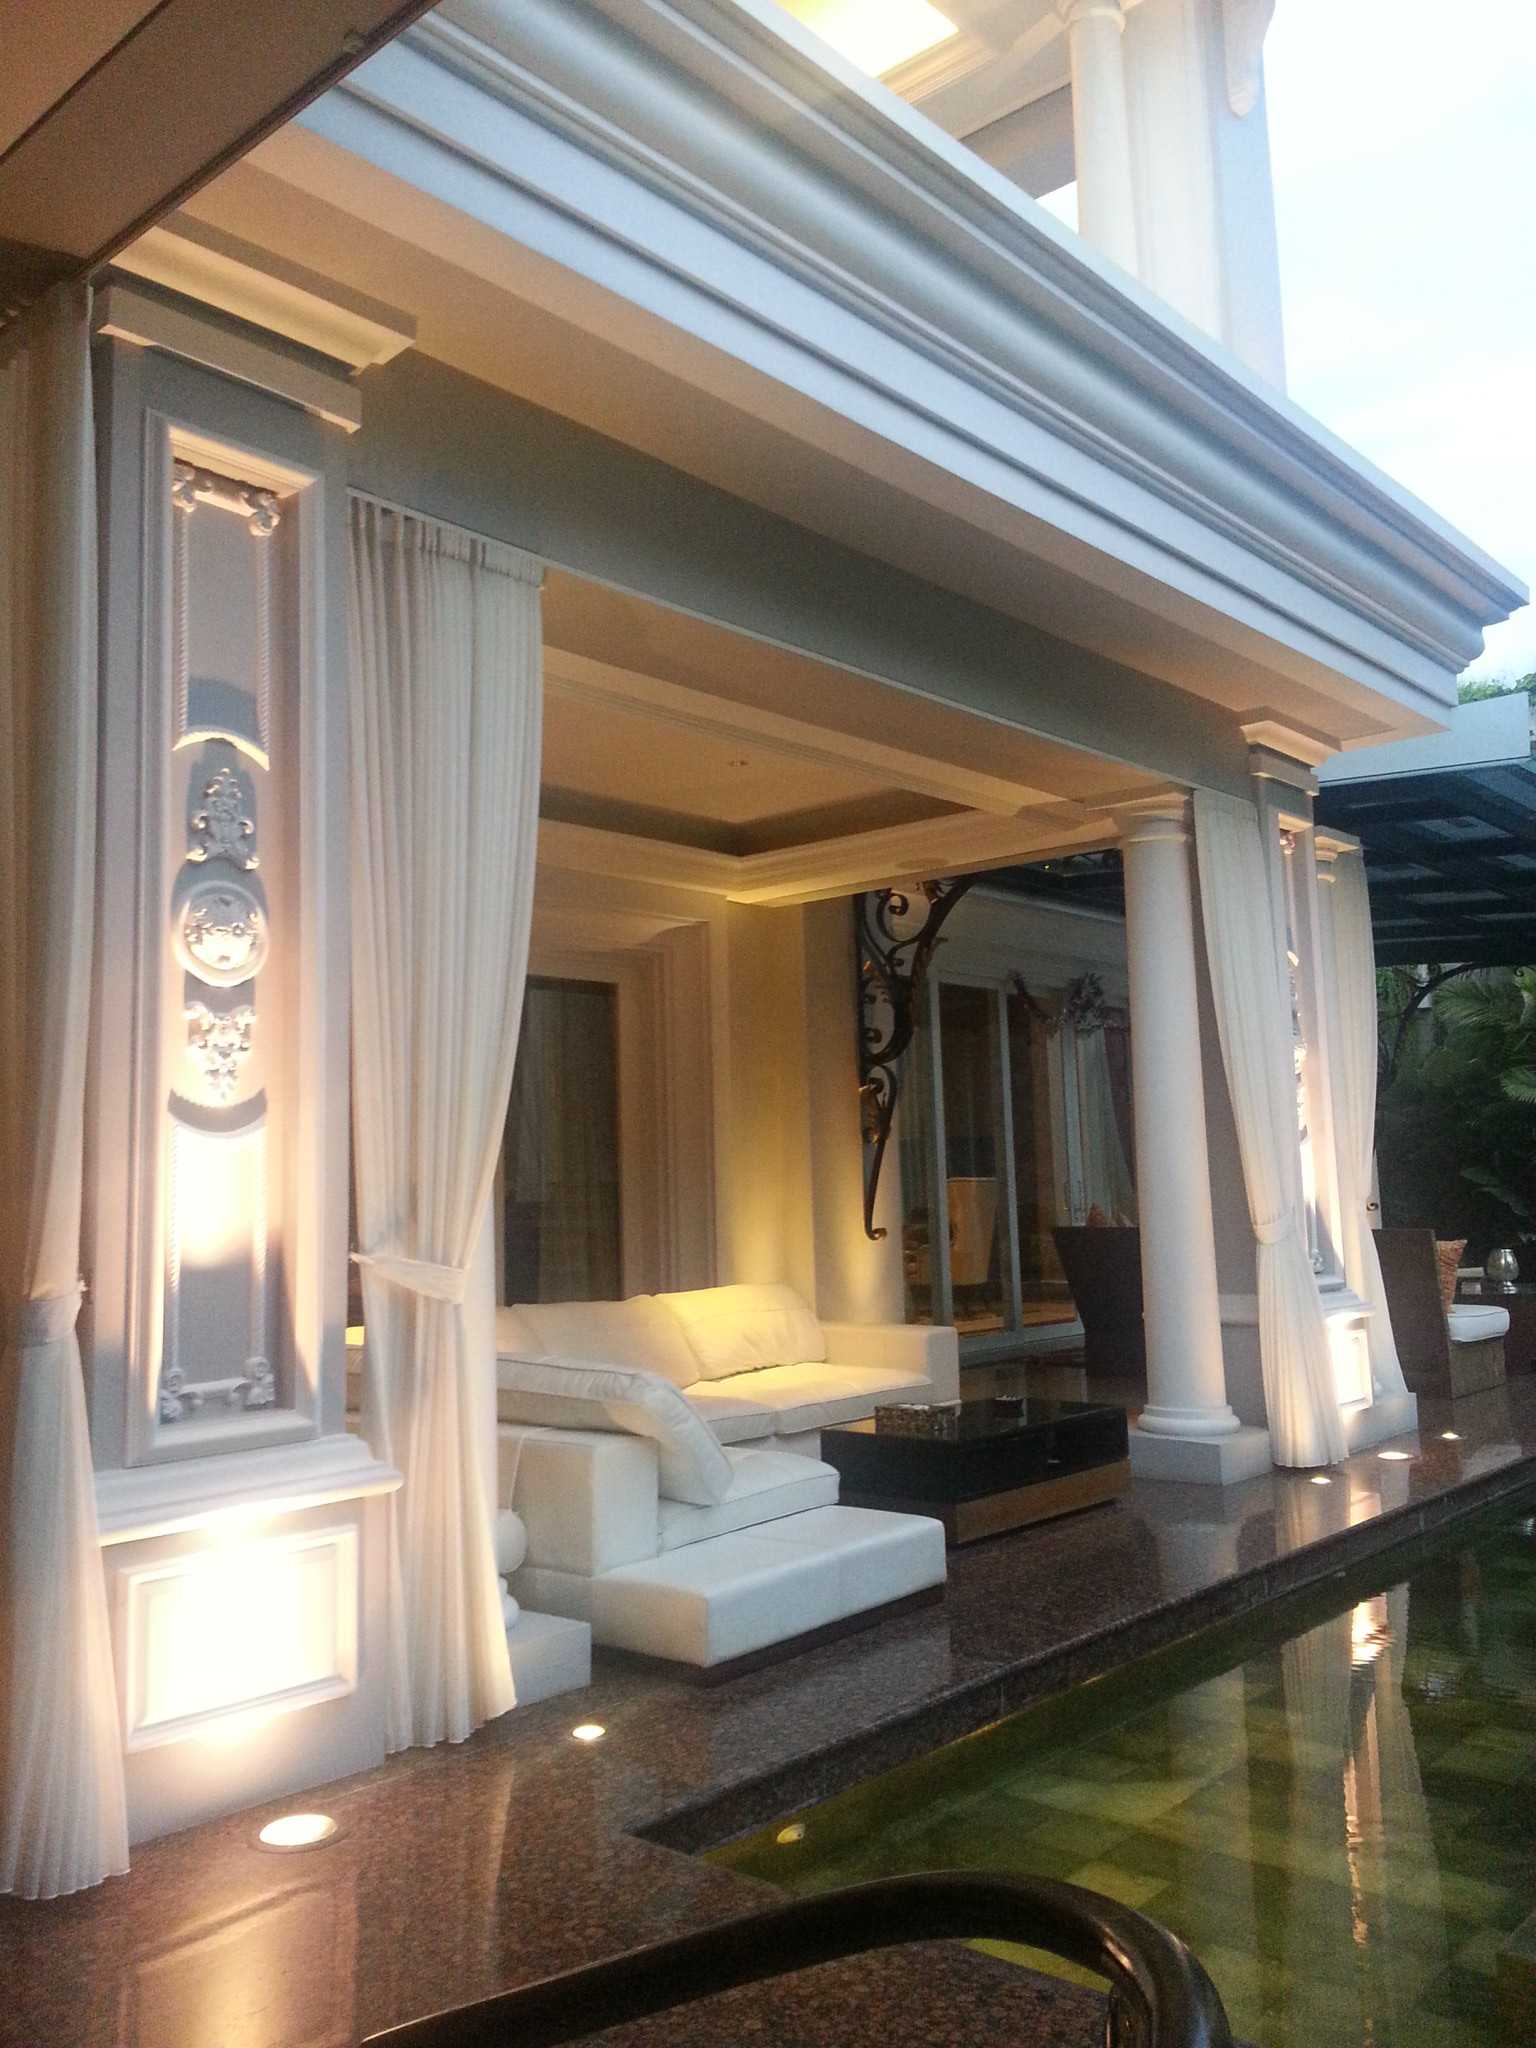 A N J A R S I T E K Classic House - Renon / Bali Renon, South Denpasar, Denpasar City, Bali, Indonesia Renon, South Denpasar, Denpasar City, Bali, Indonesia Terrace At Back House Klasik Terrace At Back House 35296